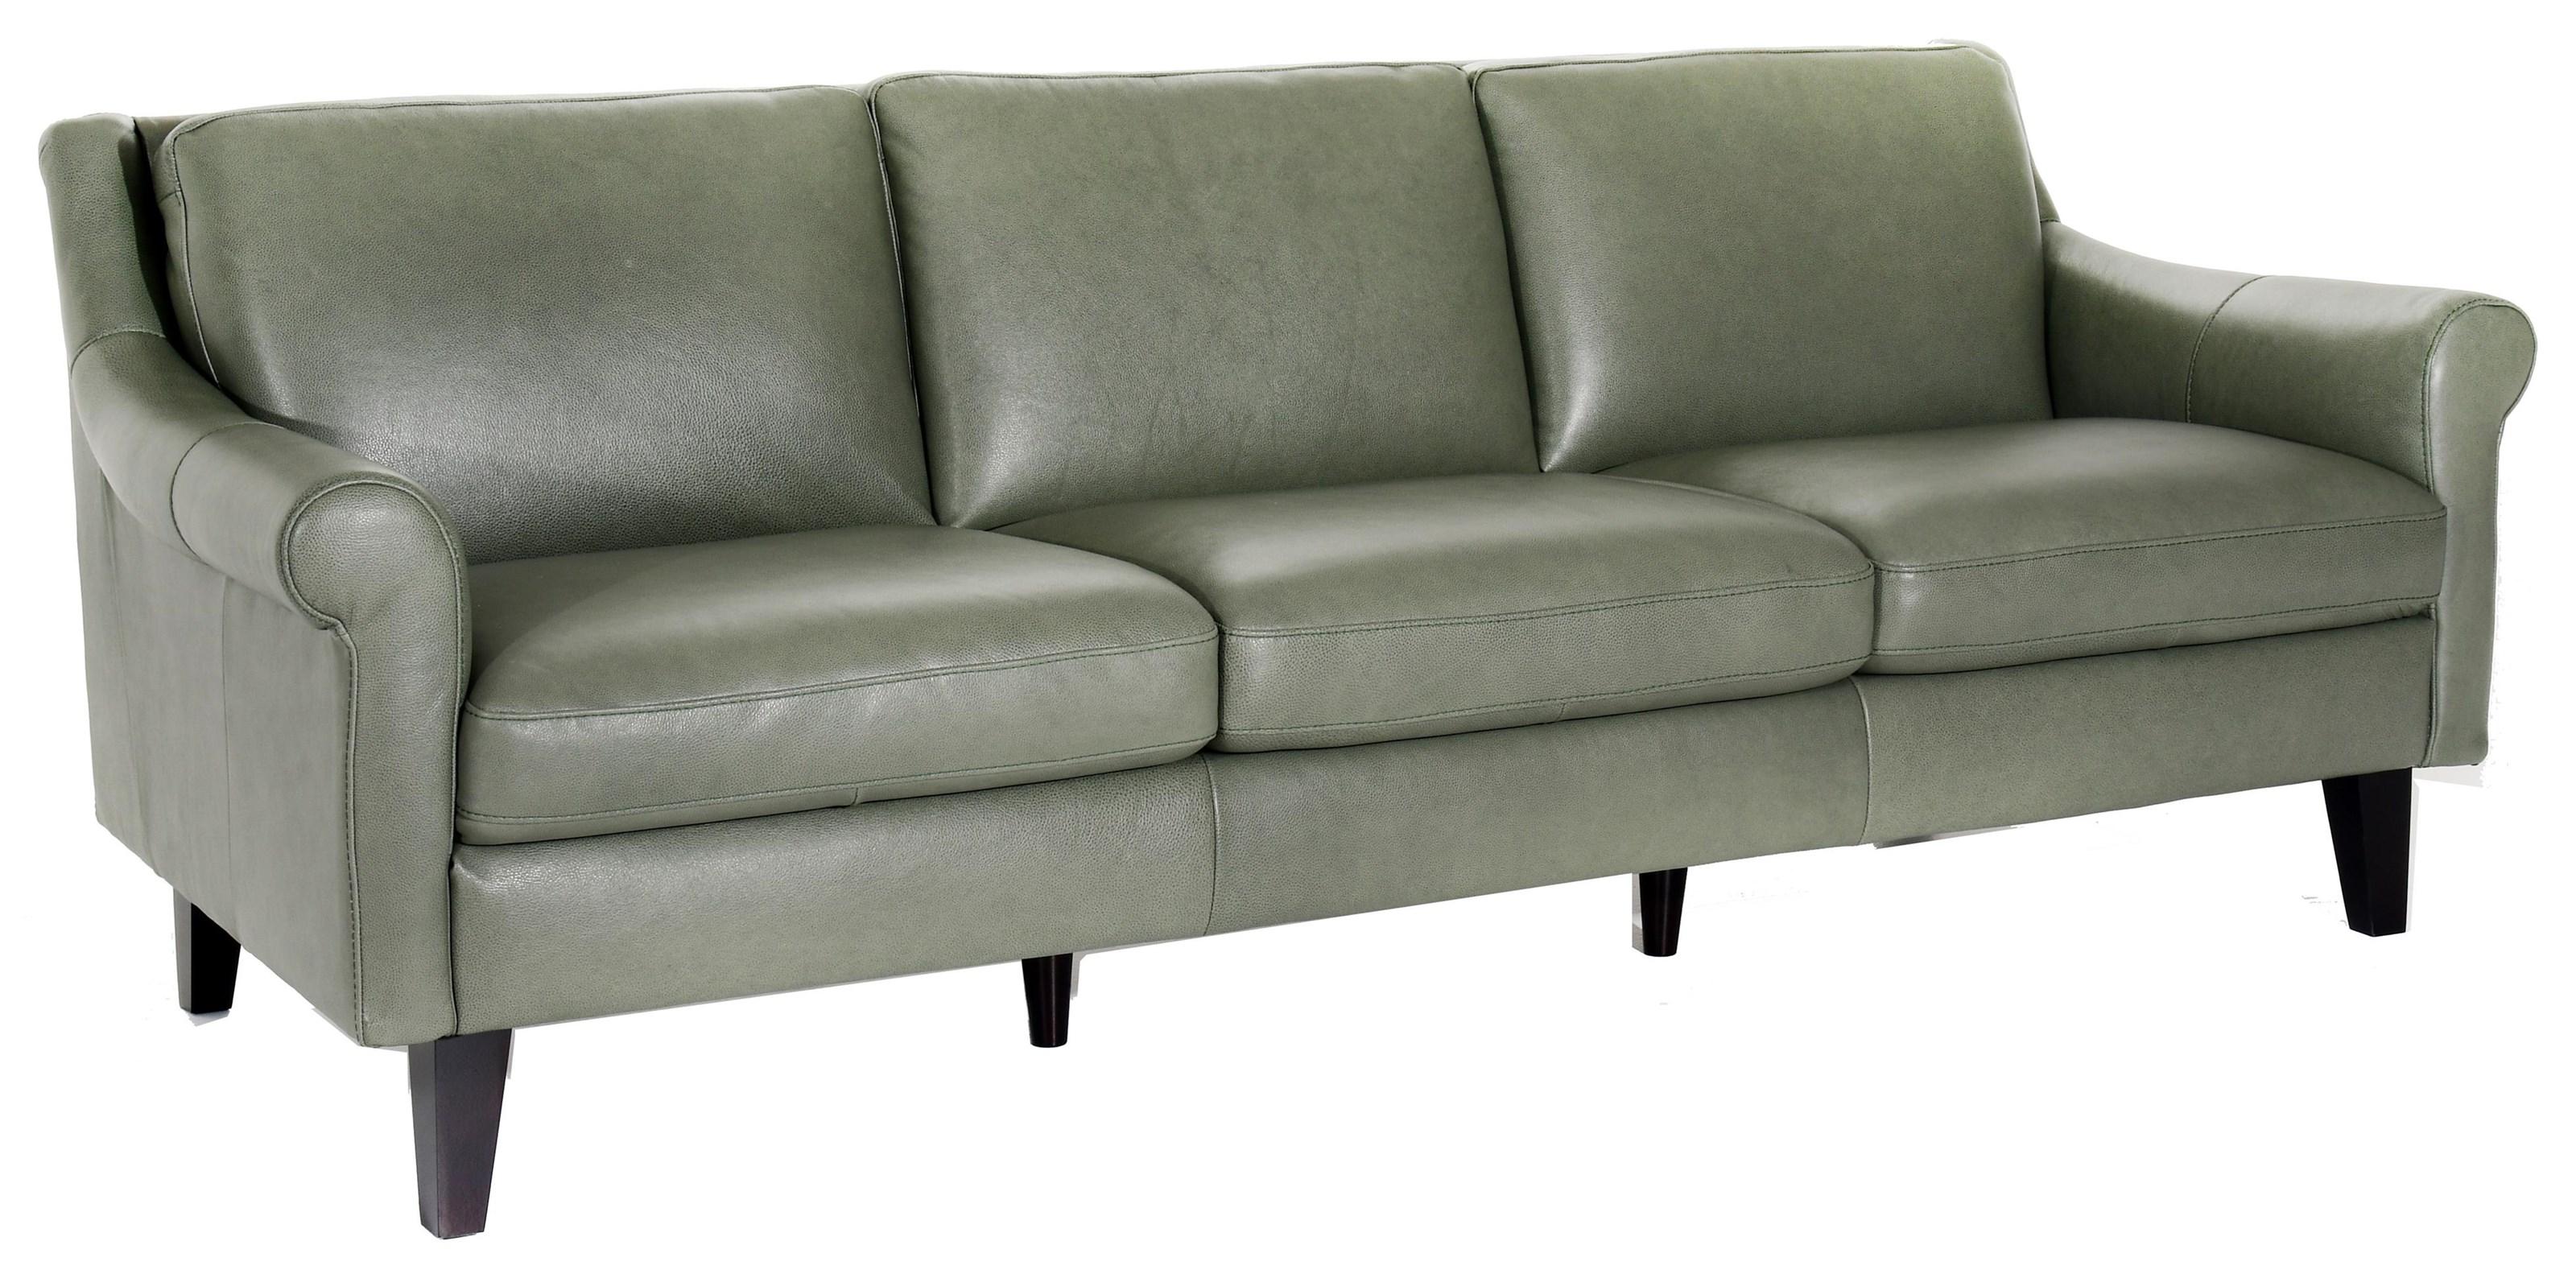 Natuzzi Editions Dolcezza Sofa - Item Number: C060-064 151Nsp-18